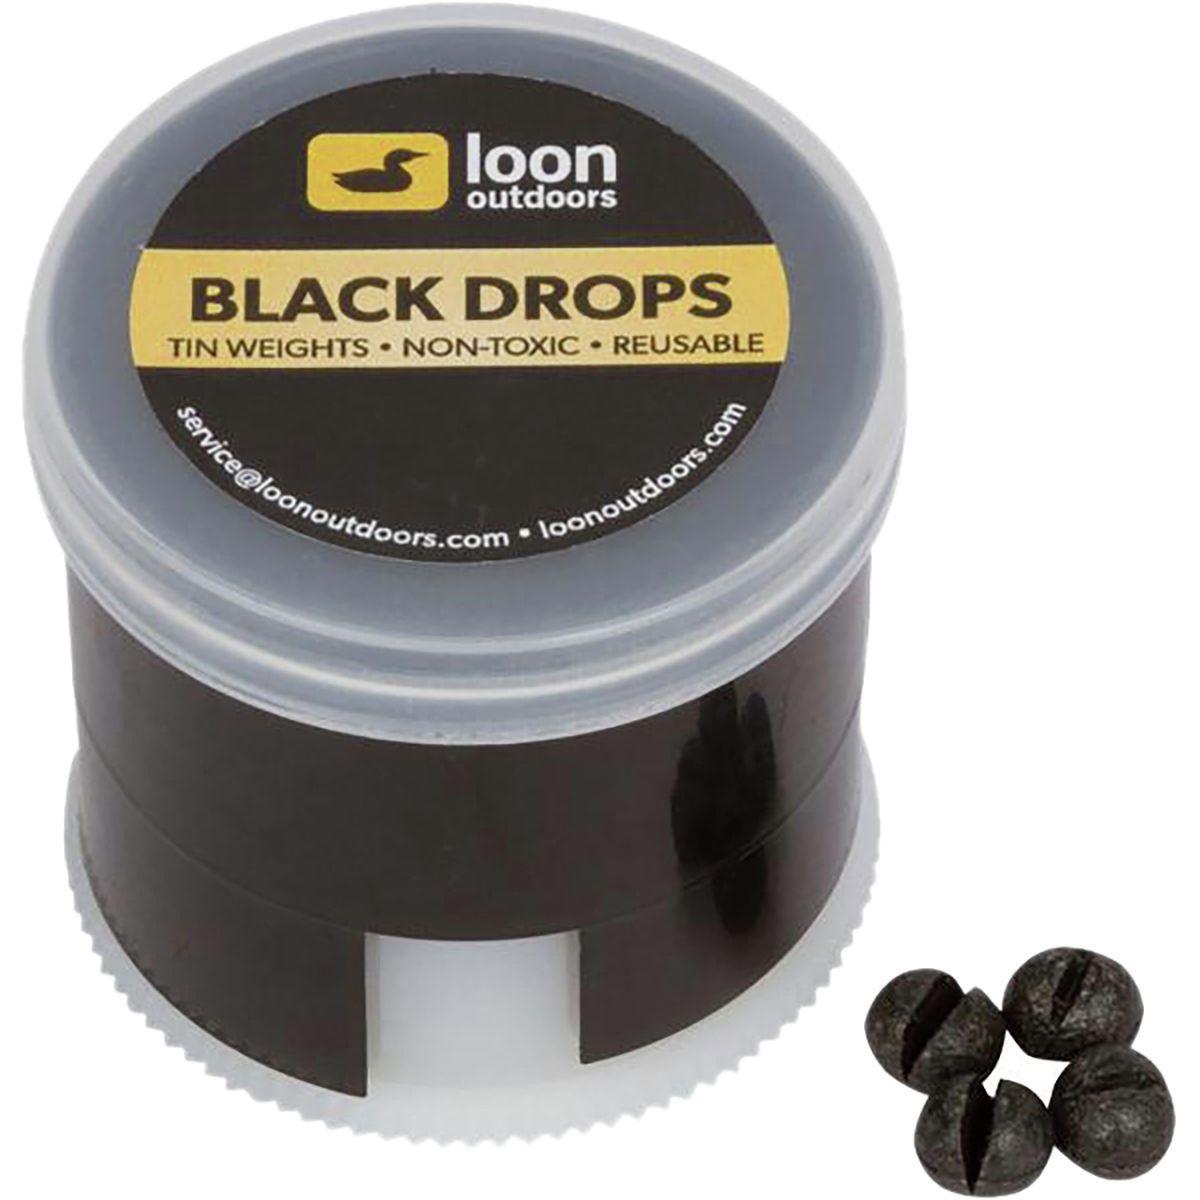 Loon Outdoors Black Drops Twist Pots Split Shot Outdoor Drop Fishing Tools